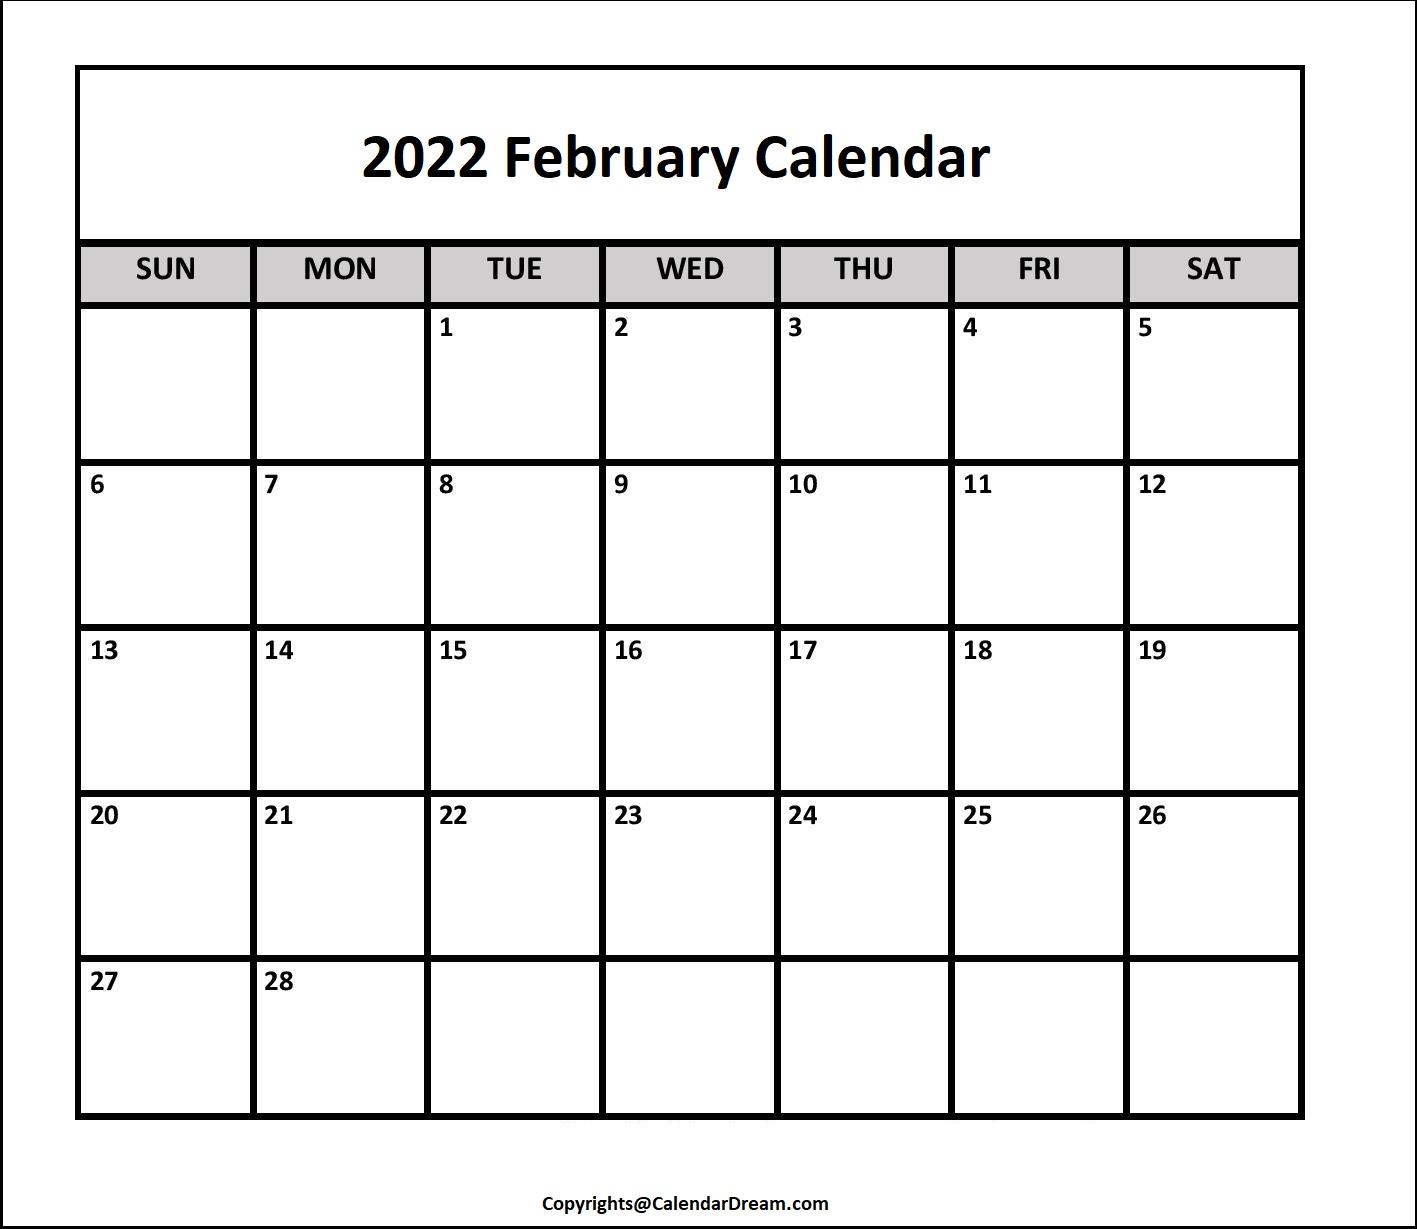 2022 February Calendar